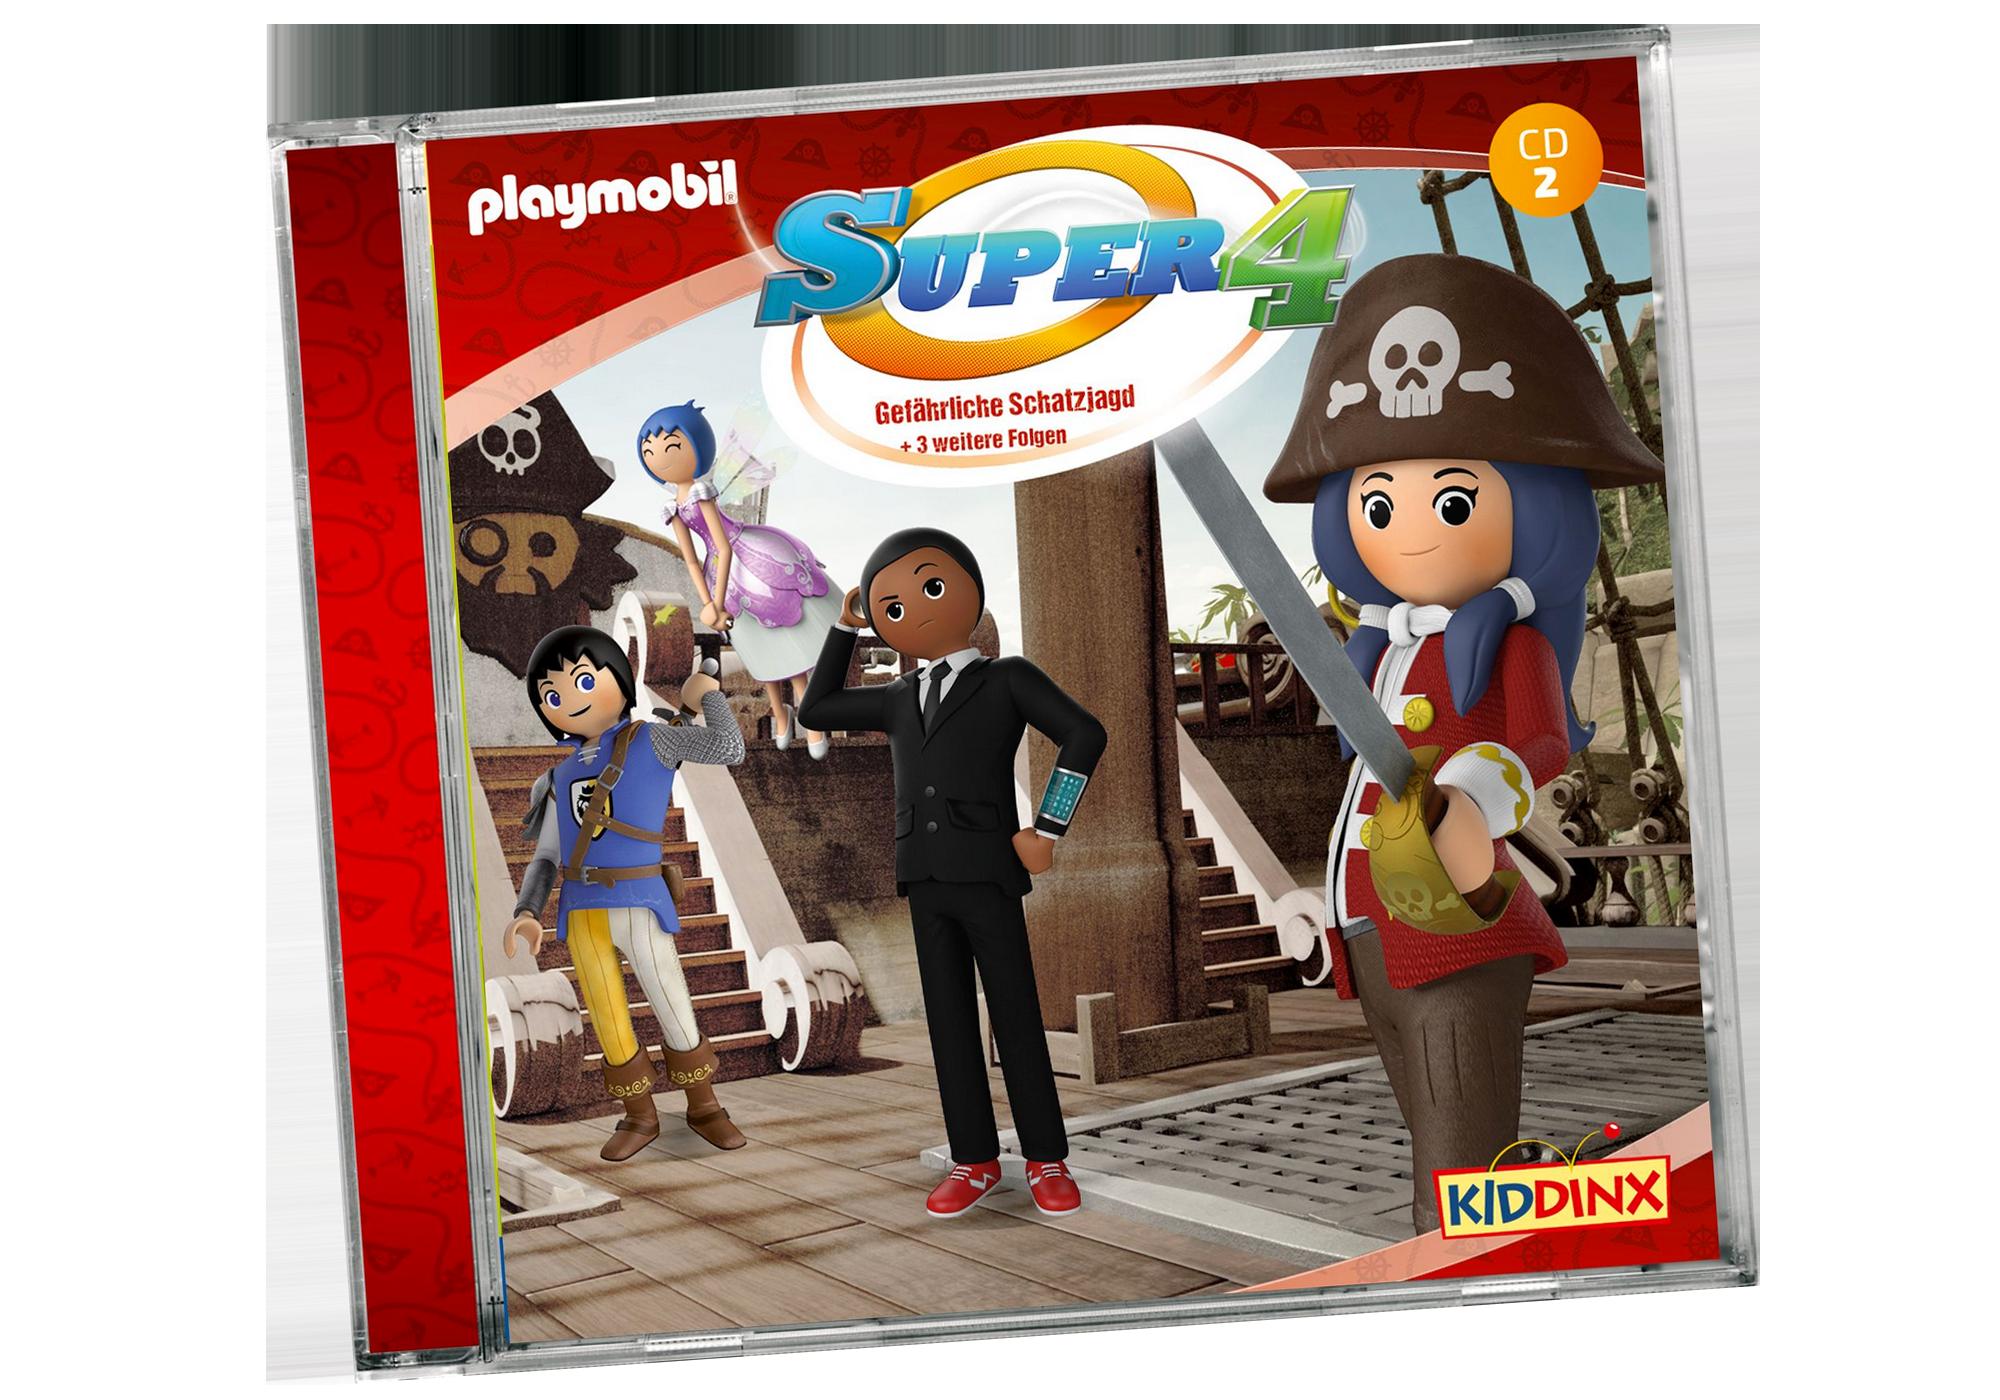 http://media.playmobil.com/i/playmobil/80475_product_detail